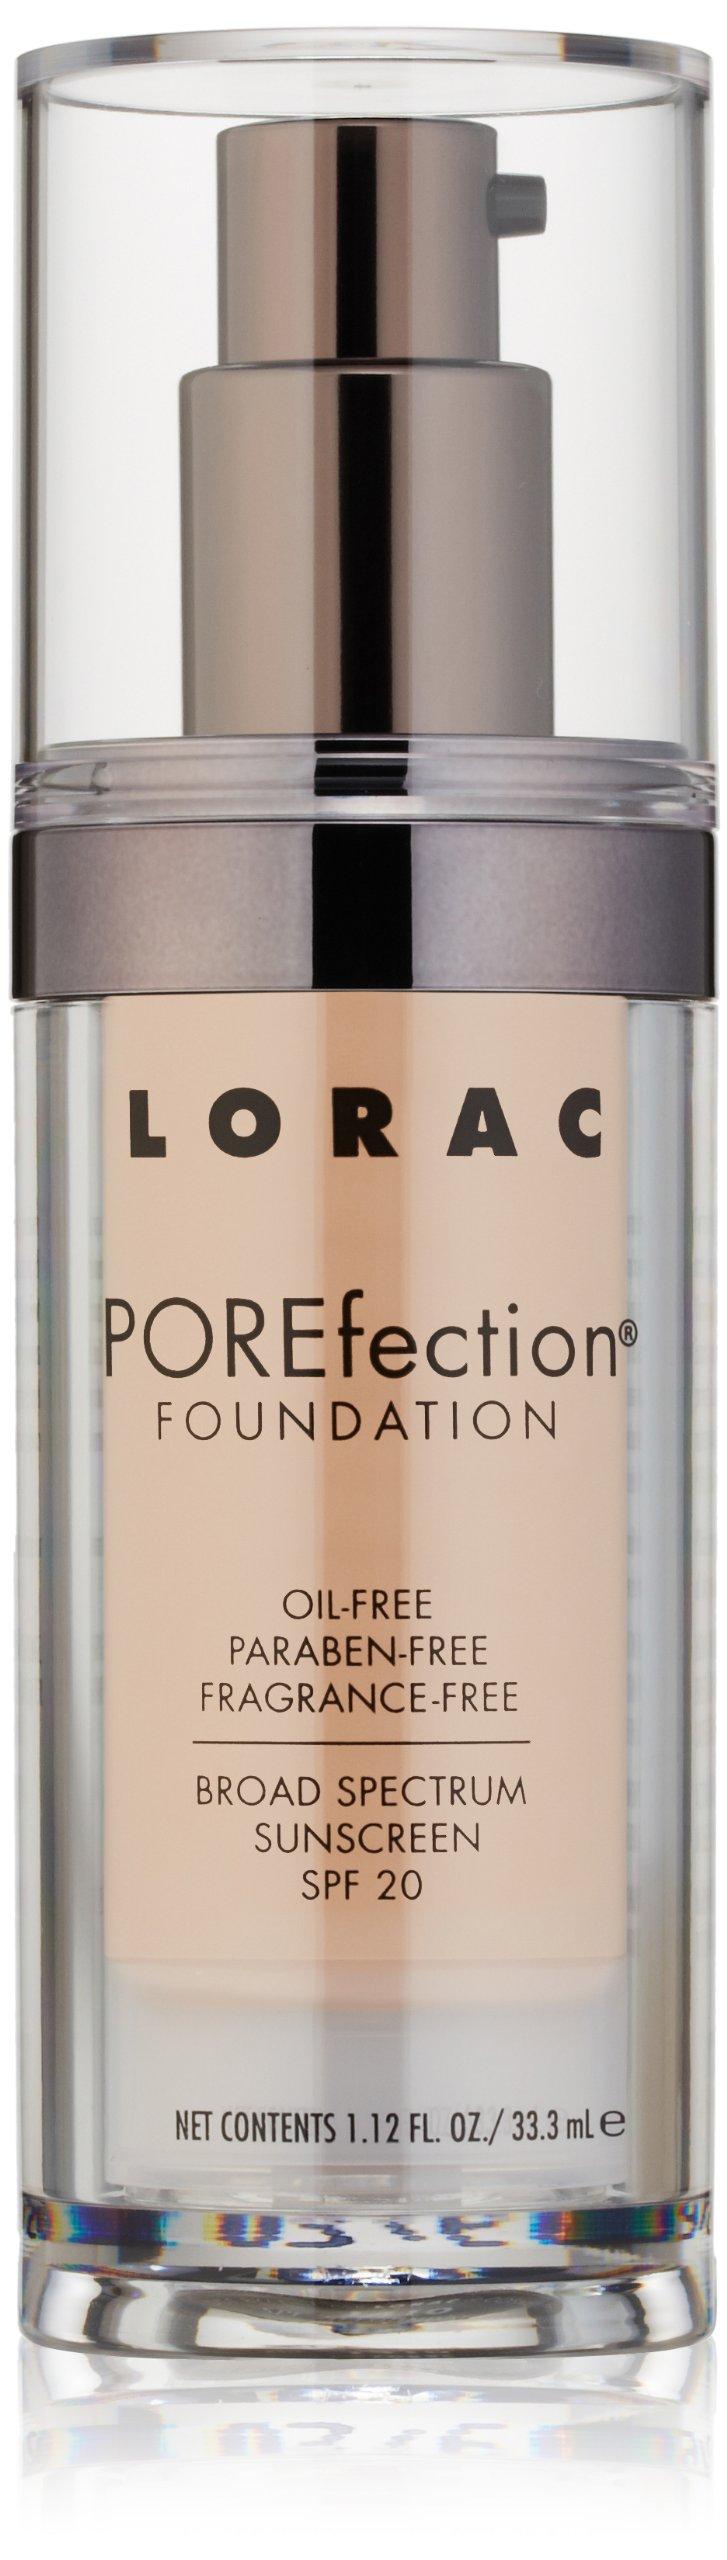 LORAC POREfection Foundation, PR4-Light Medium, 1.12 fl. oz.